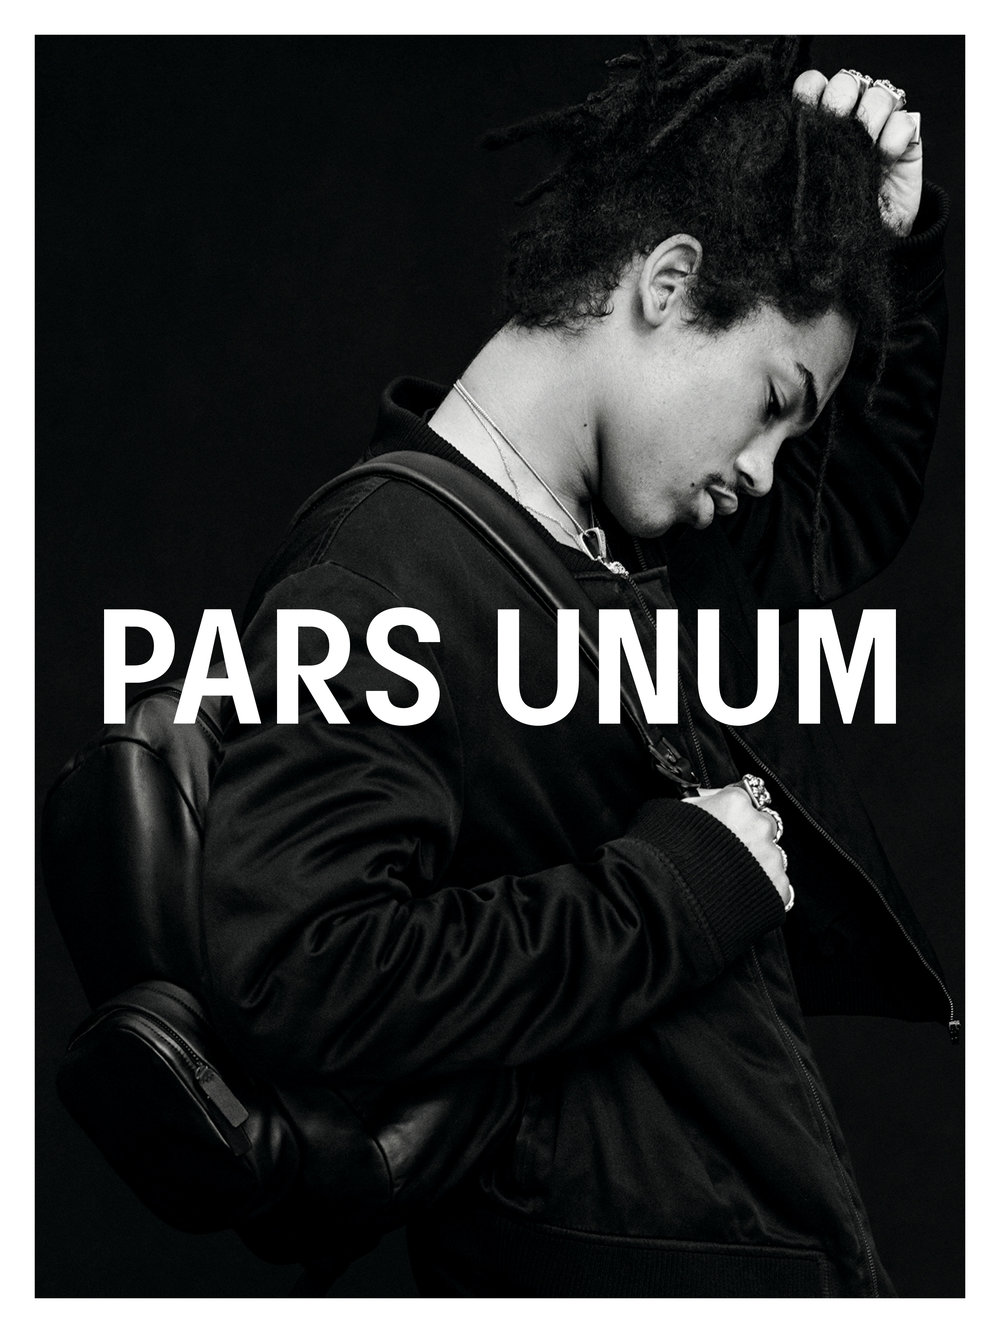 PARS_UNUM_Lookbook3.jpg